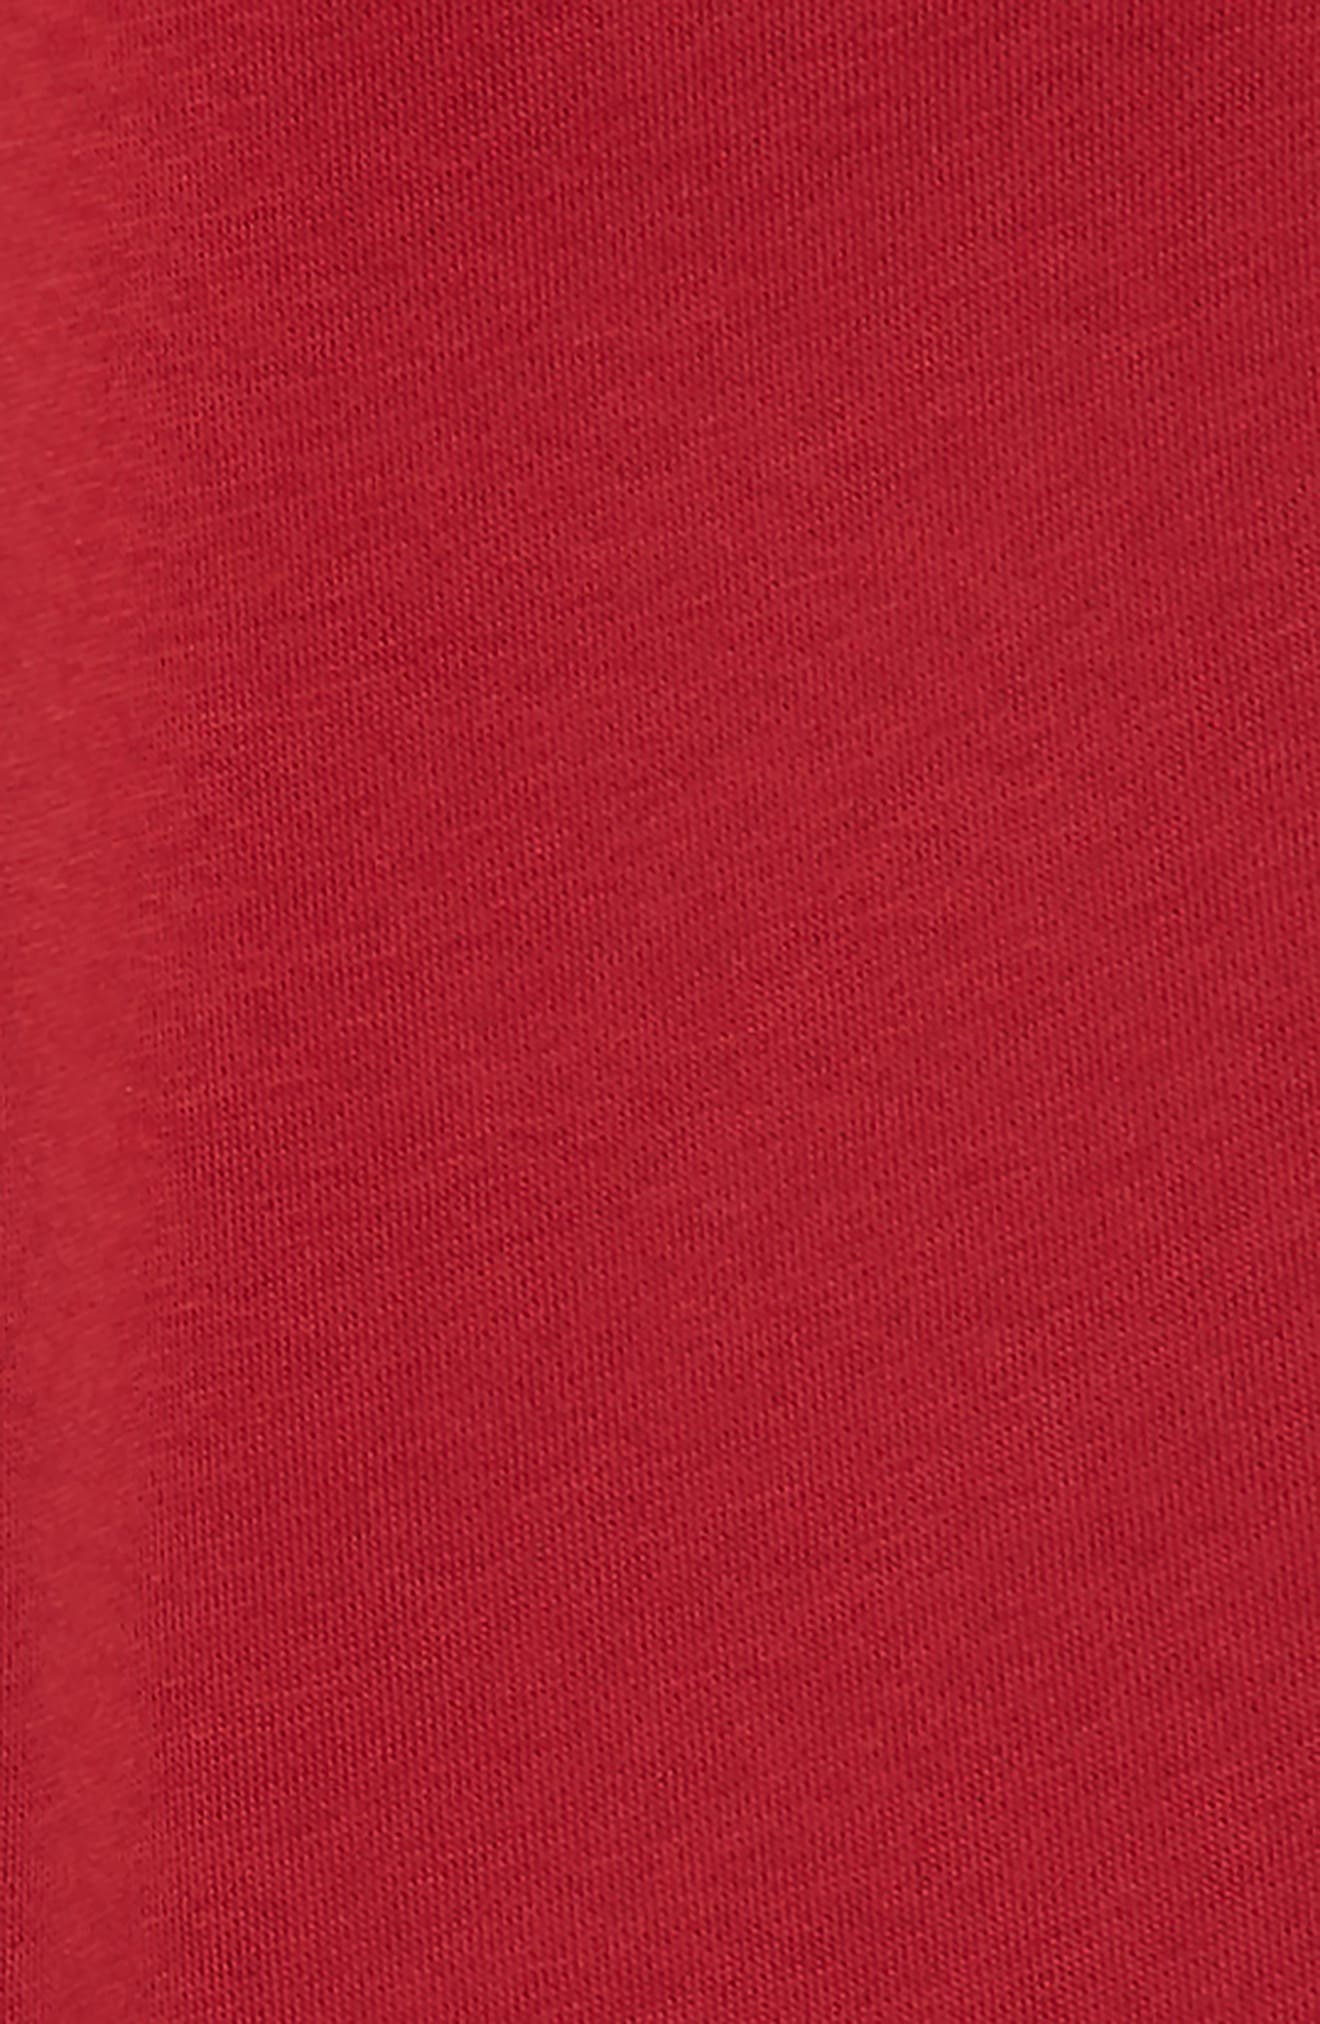 LACOSTE, Fleece Pants, Alternate thumbnail 2, color, LIGHTHOUSE RED